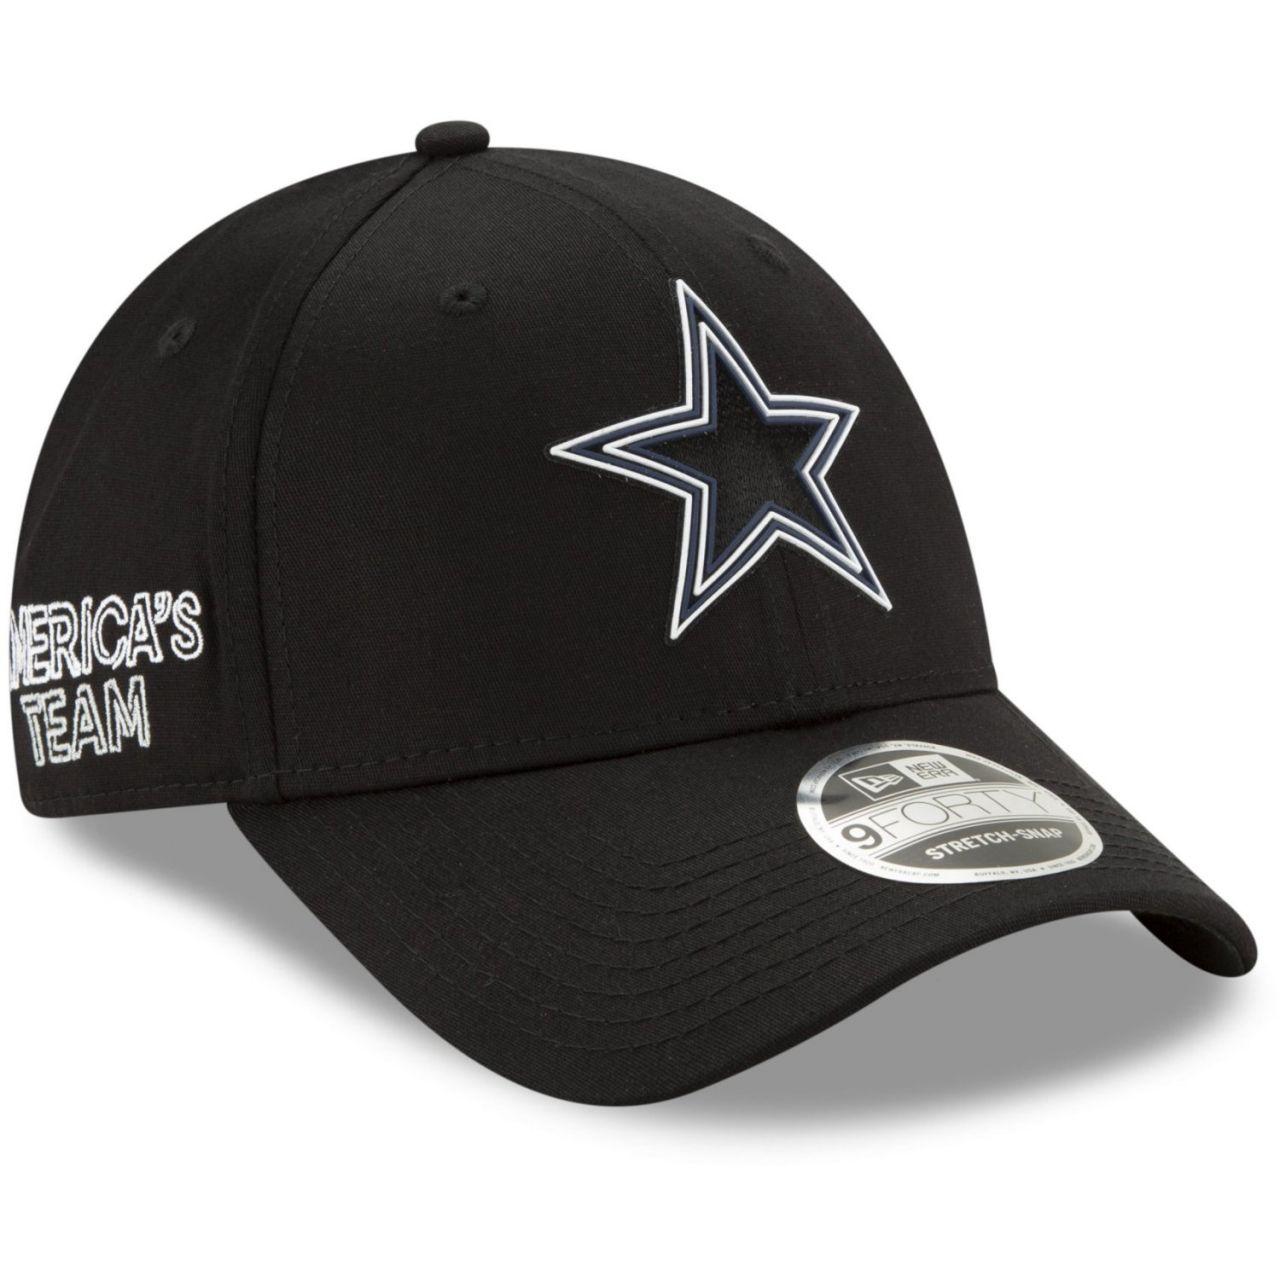 amfoo - New Era 9FORTY Stretch Snap Cap - 2020 DRAFT Dallas Cowboys